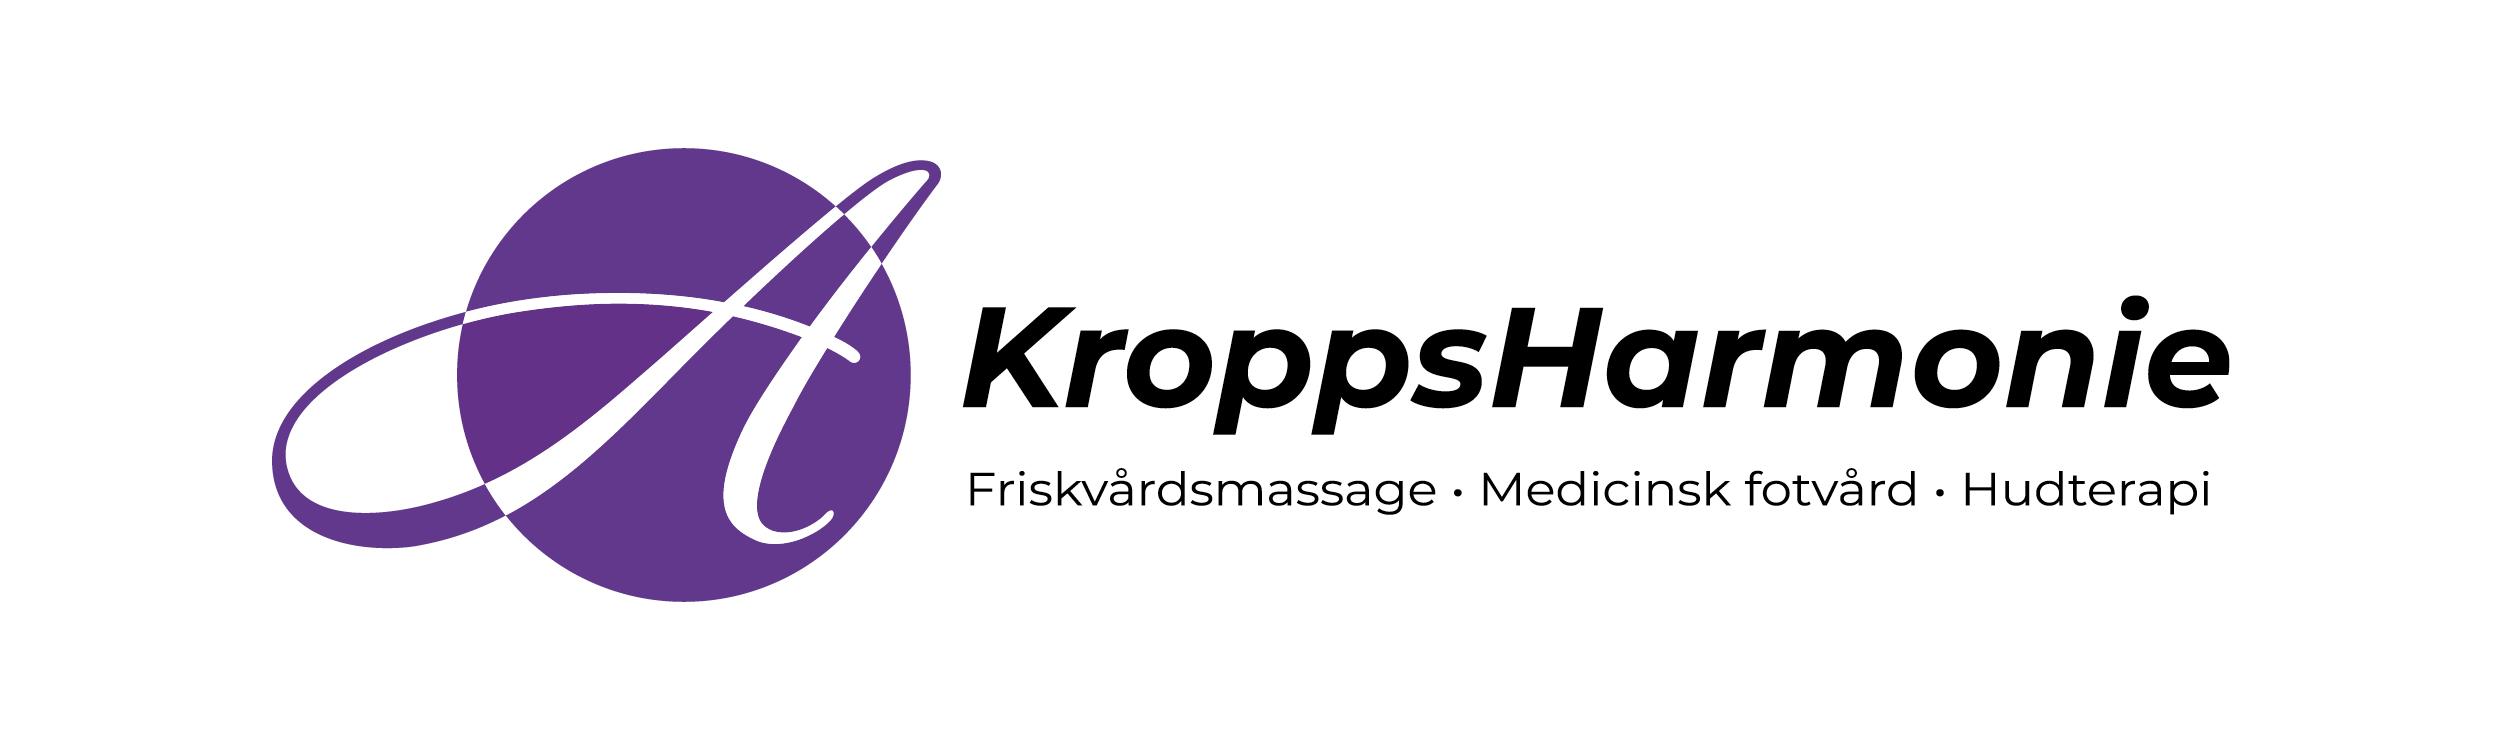 Salong A KroppsHarmonie